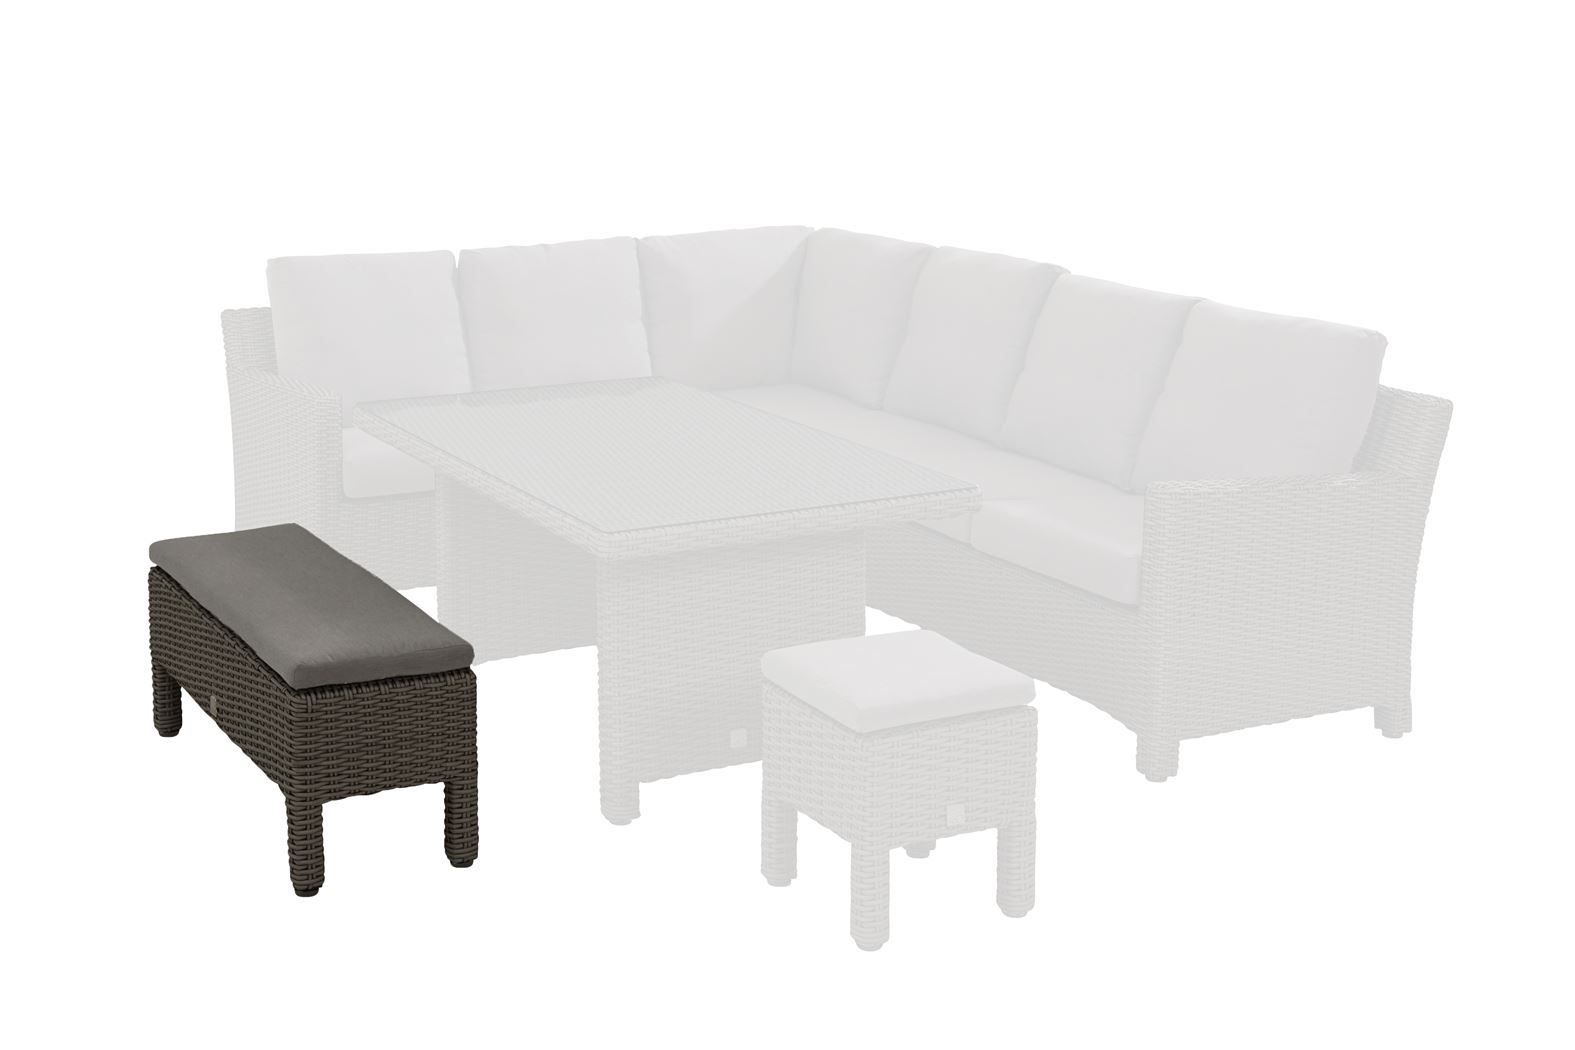 4so adora cosy dining bench (big stool) with cushion nero